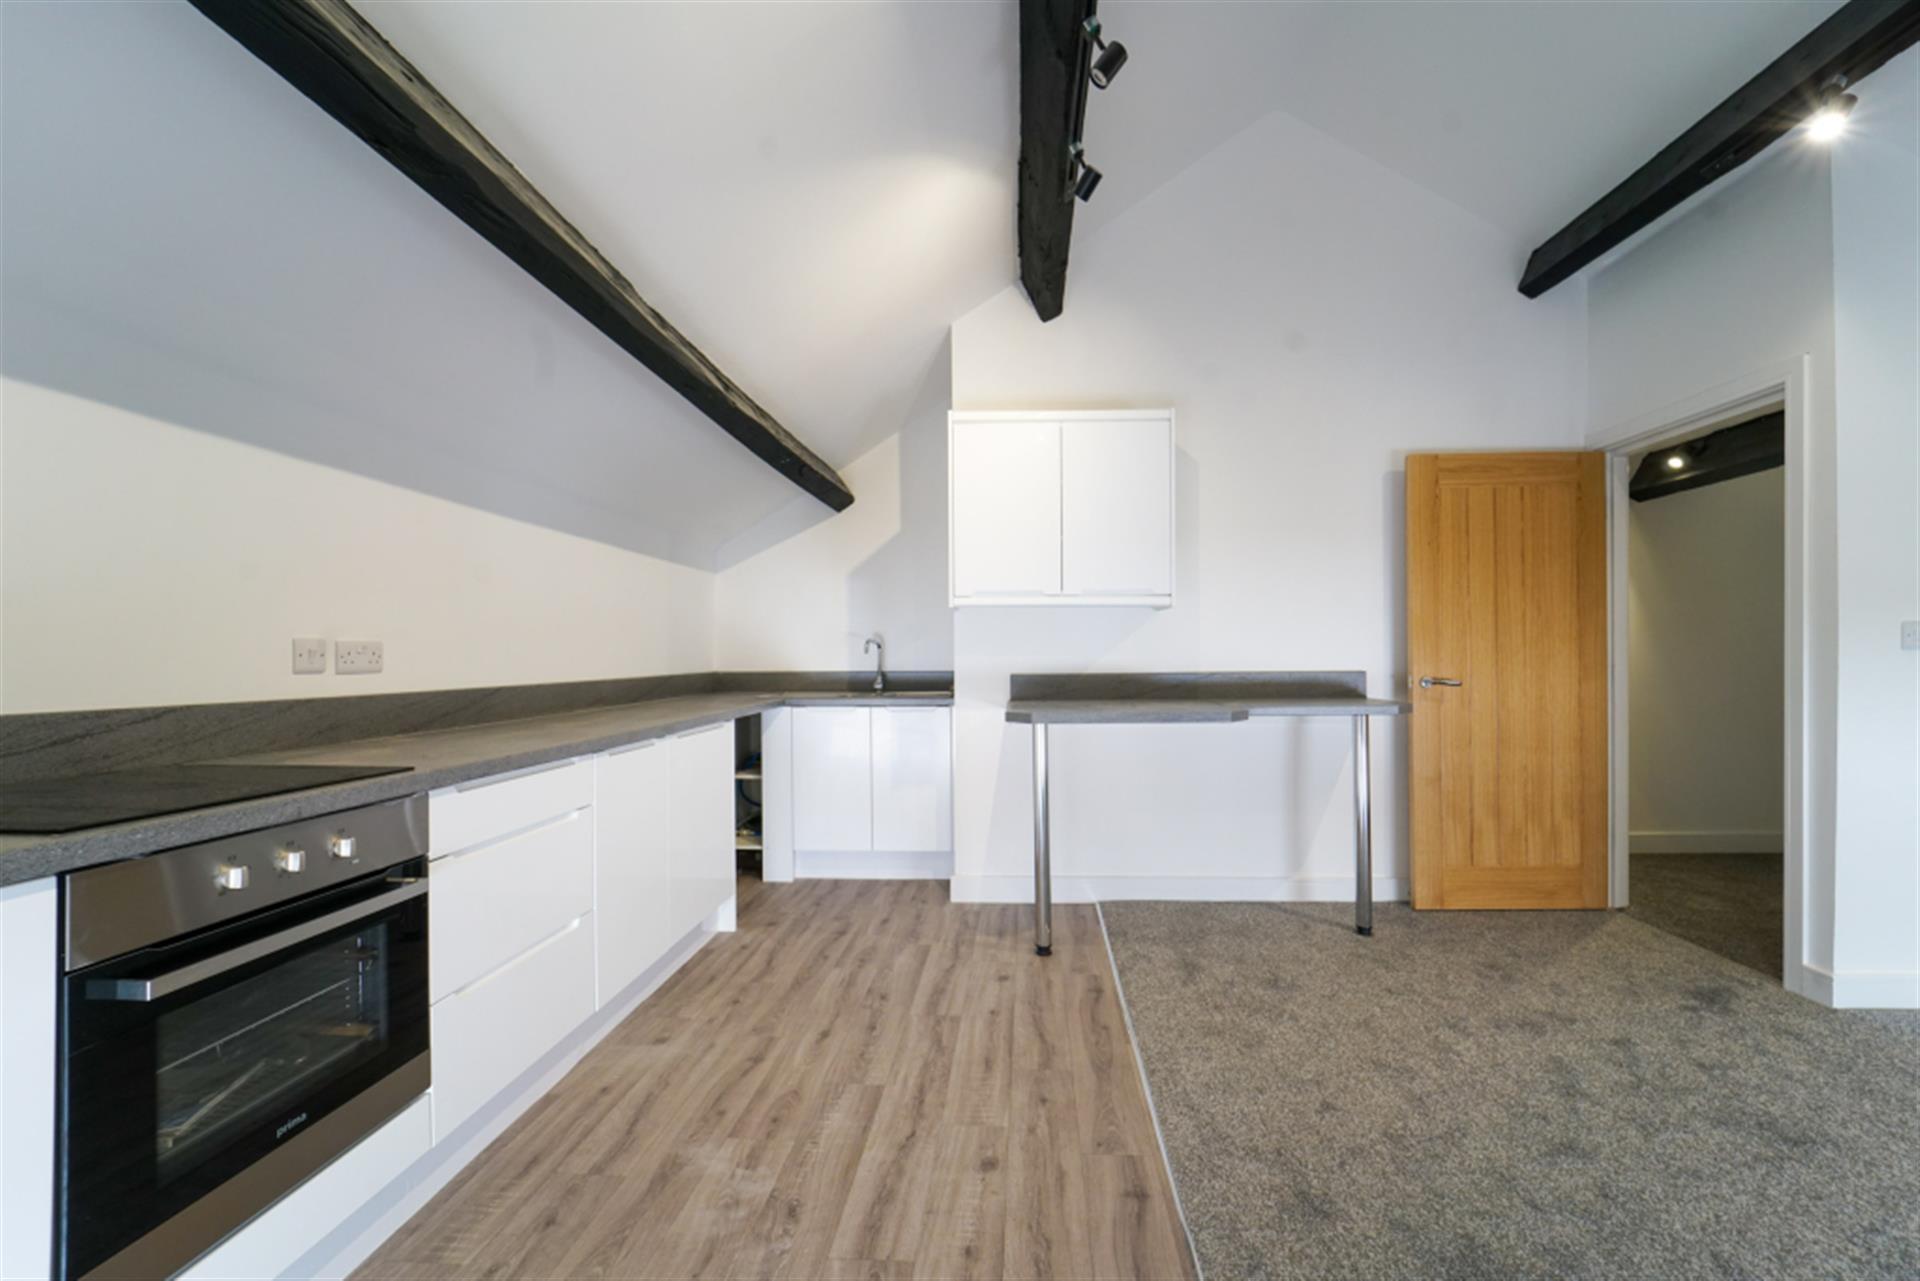 2 bedroom apartment flat / apartment To Let in 96 Watery Lane, Whitehall, Darwen, Lancs - Open Plan Lounge/Kit